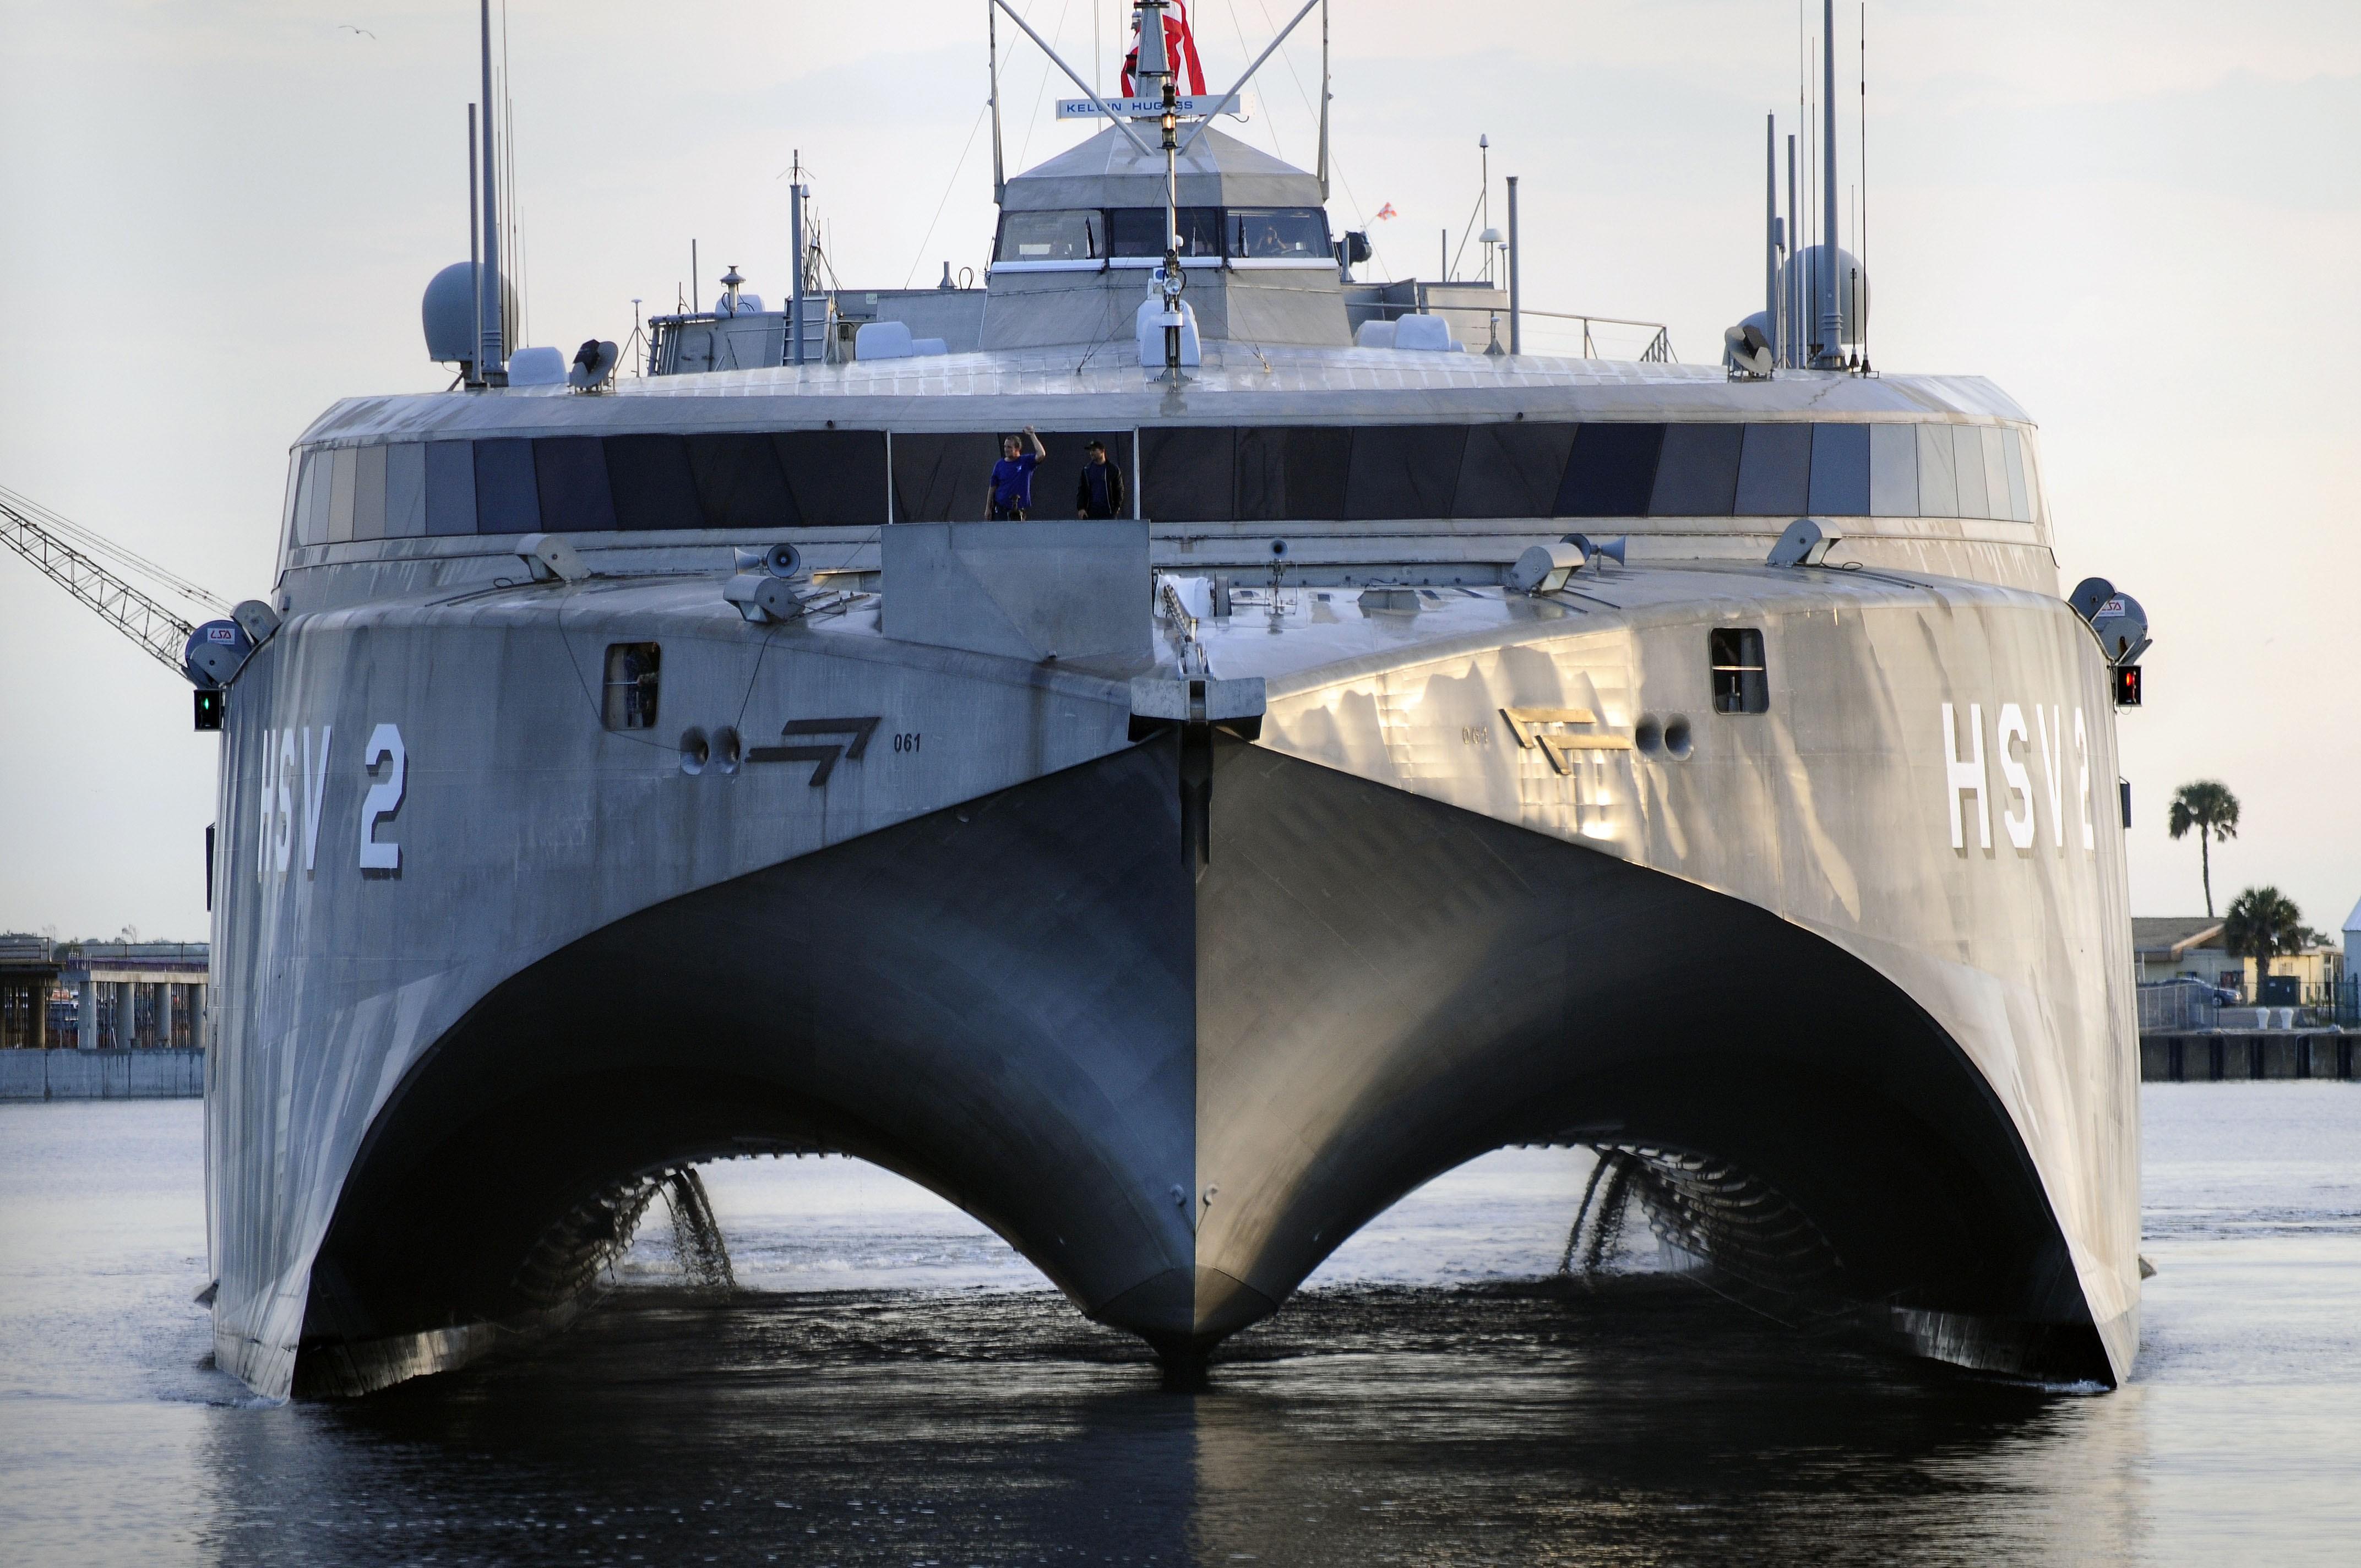 HSV-2 Swift Wallpaper, Military: HSV-2 Swift, catamaran, U.S. Navy ...